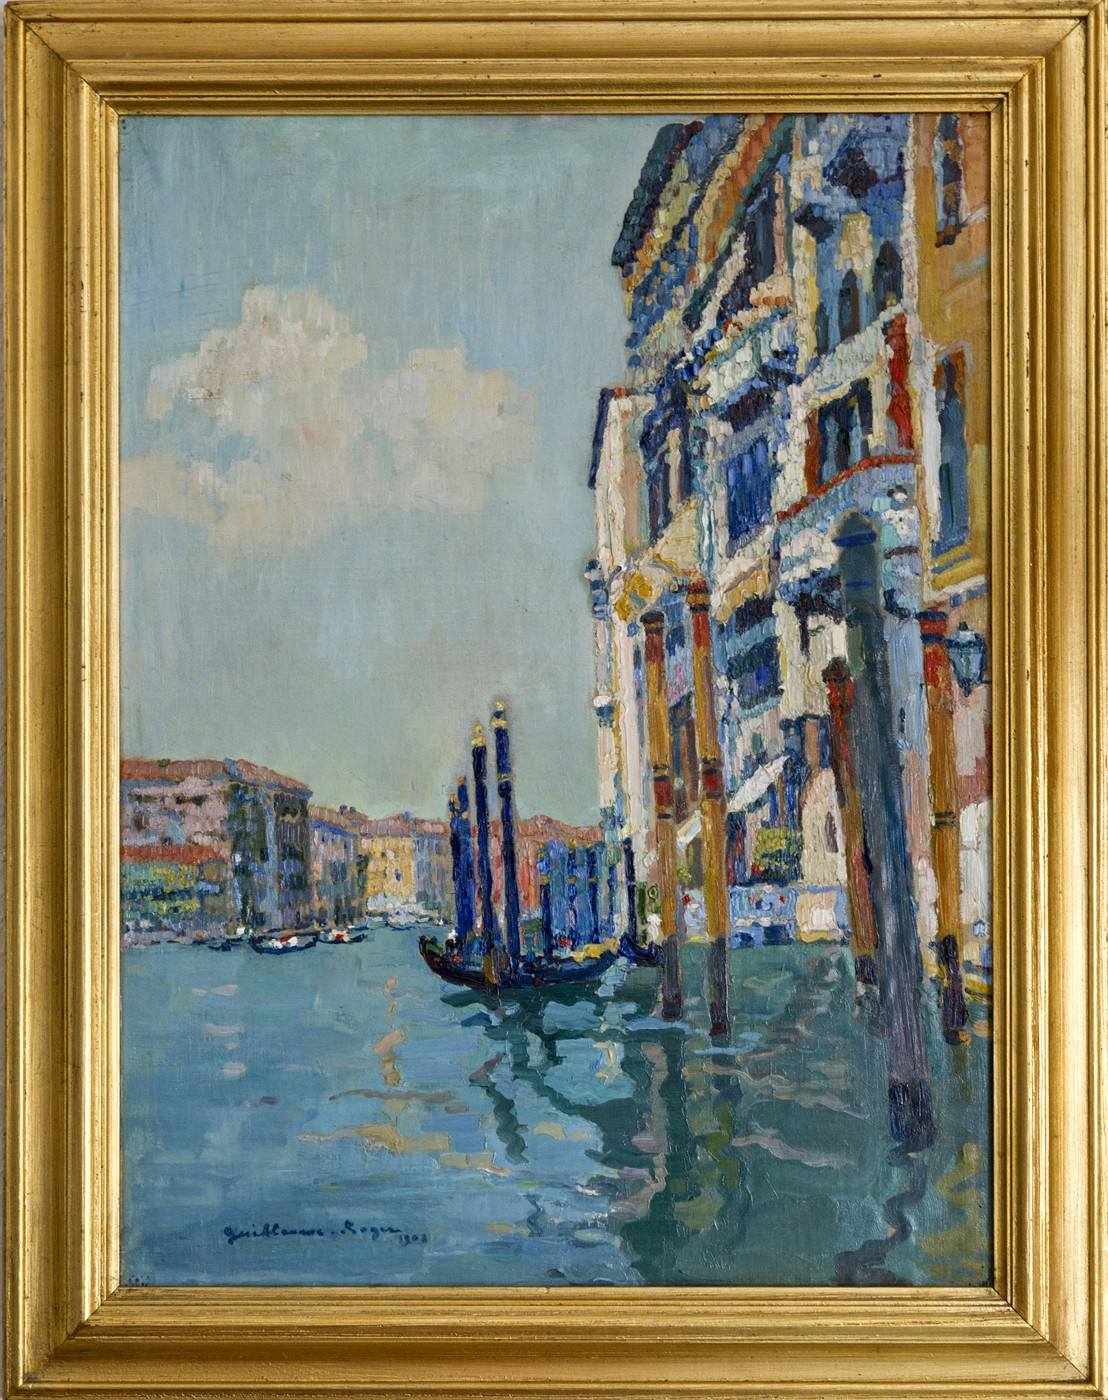 Venedig am Canale Grande (1902)